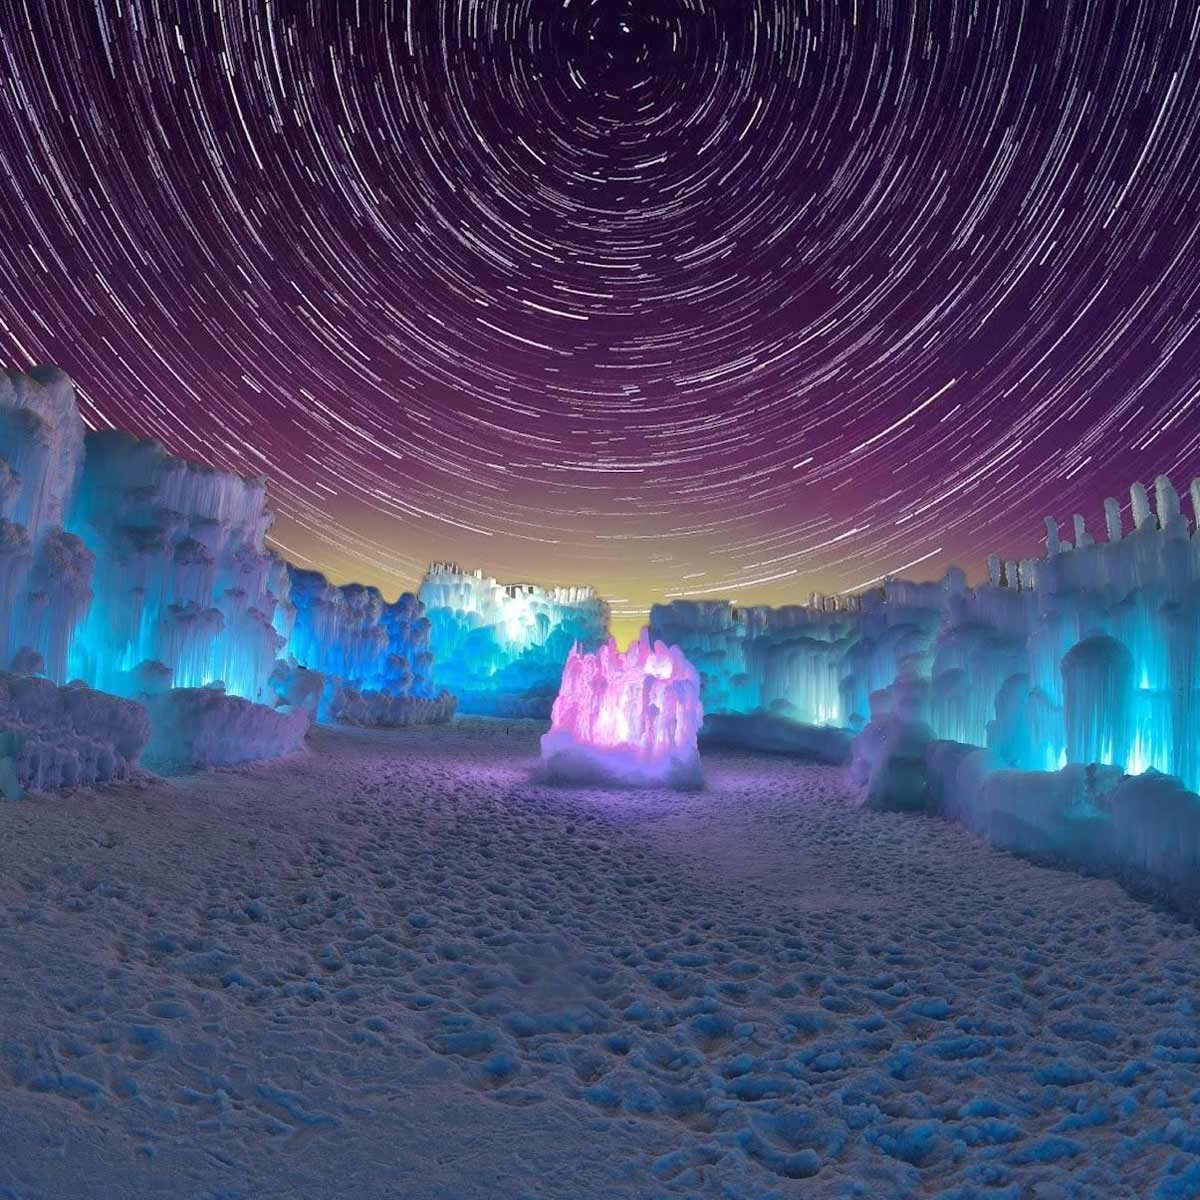 ice_castles__1 stary night